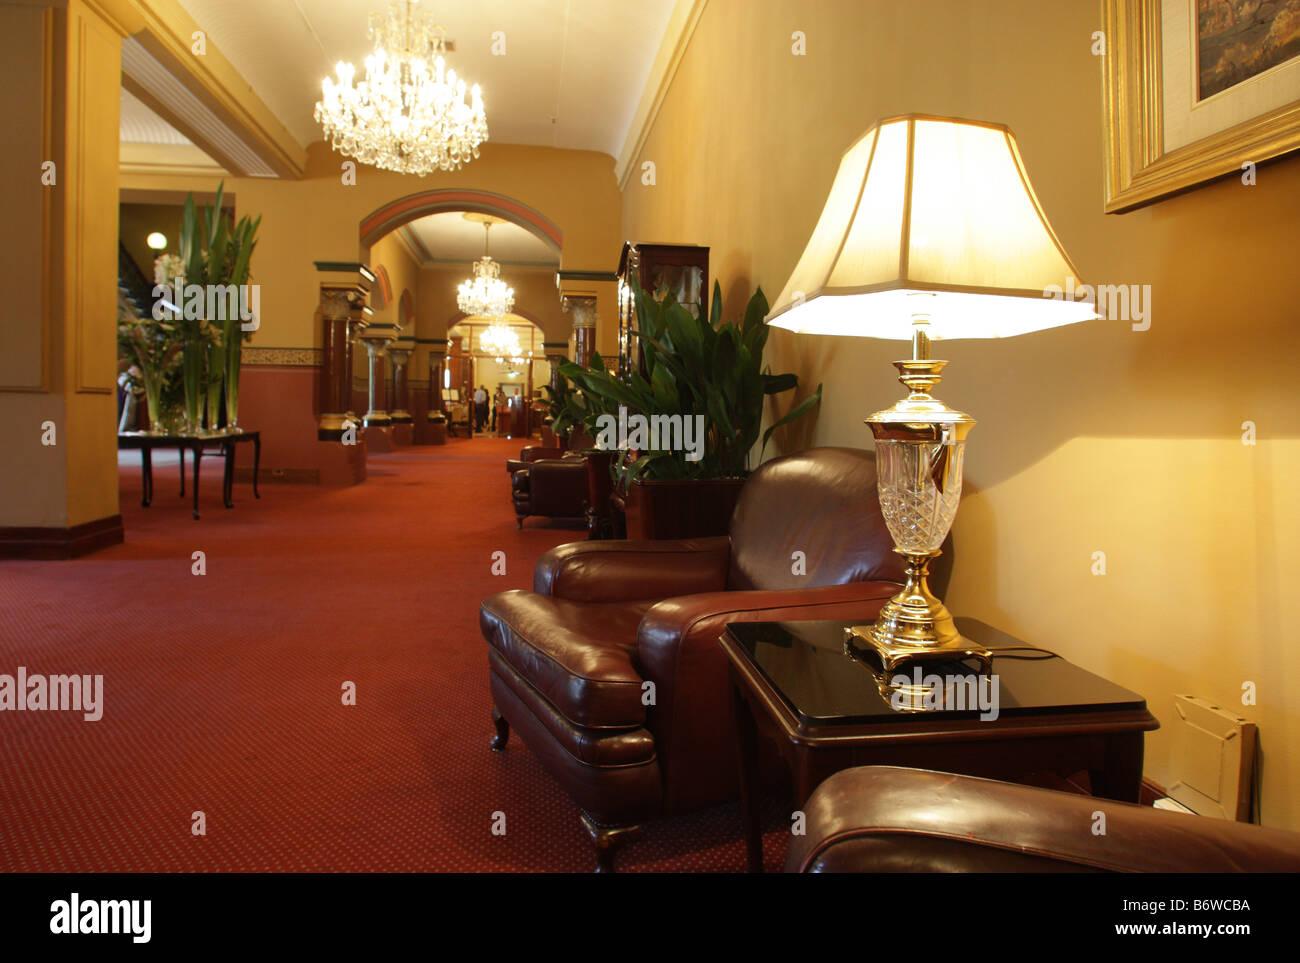 The Hotel Windsor,luxury hotel in Melbourne,Victoria,Australia - Stock Image